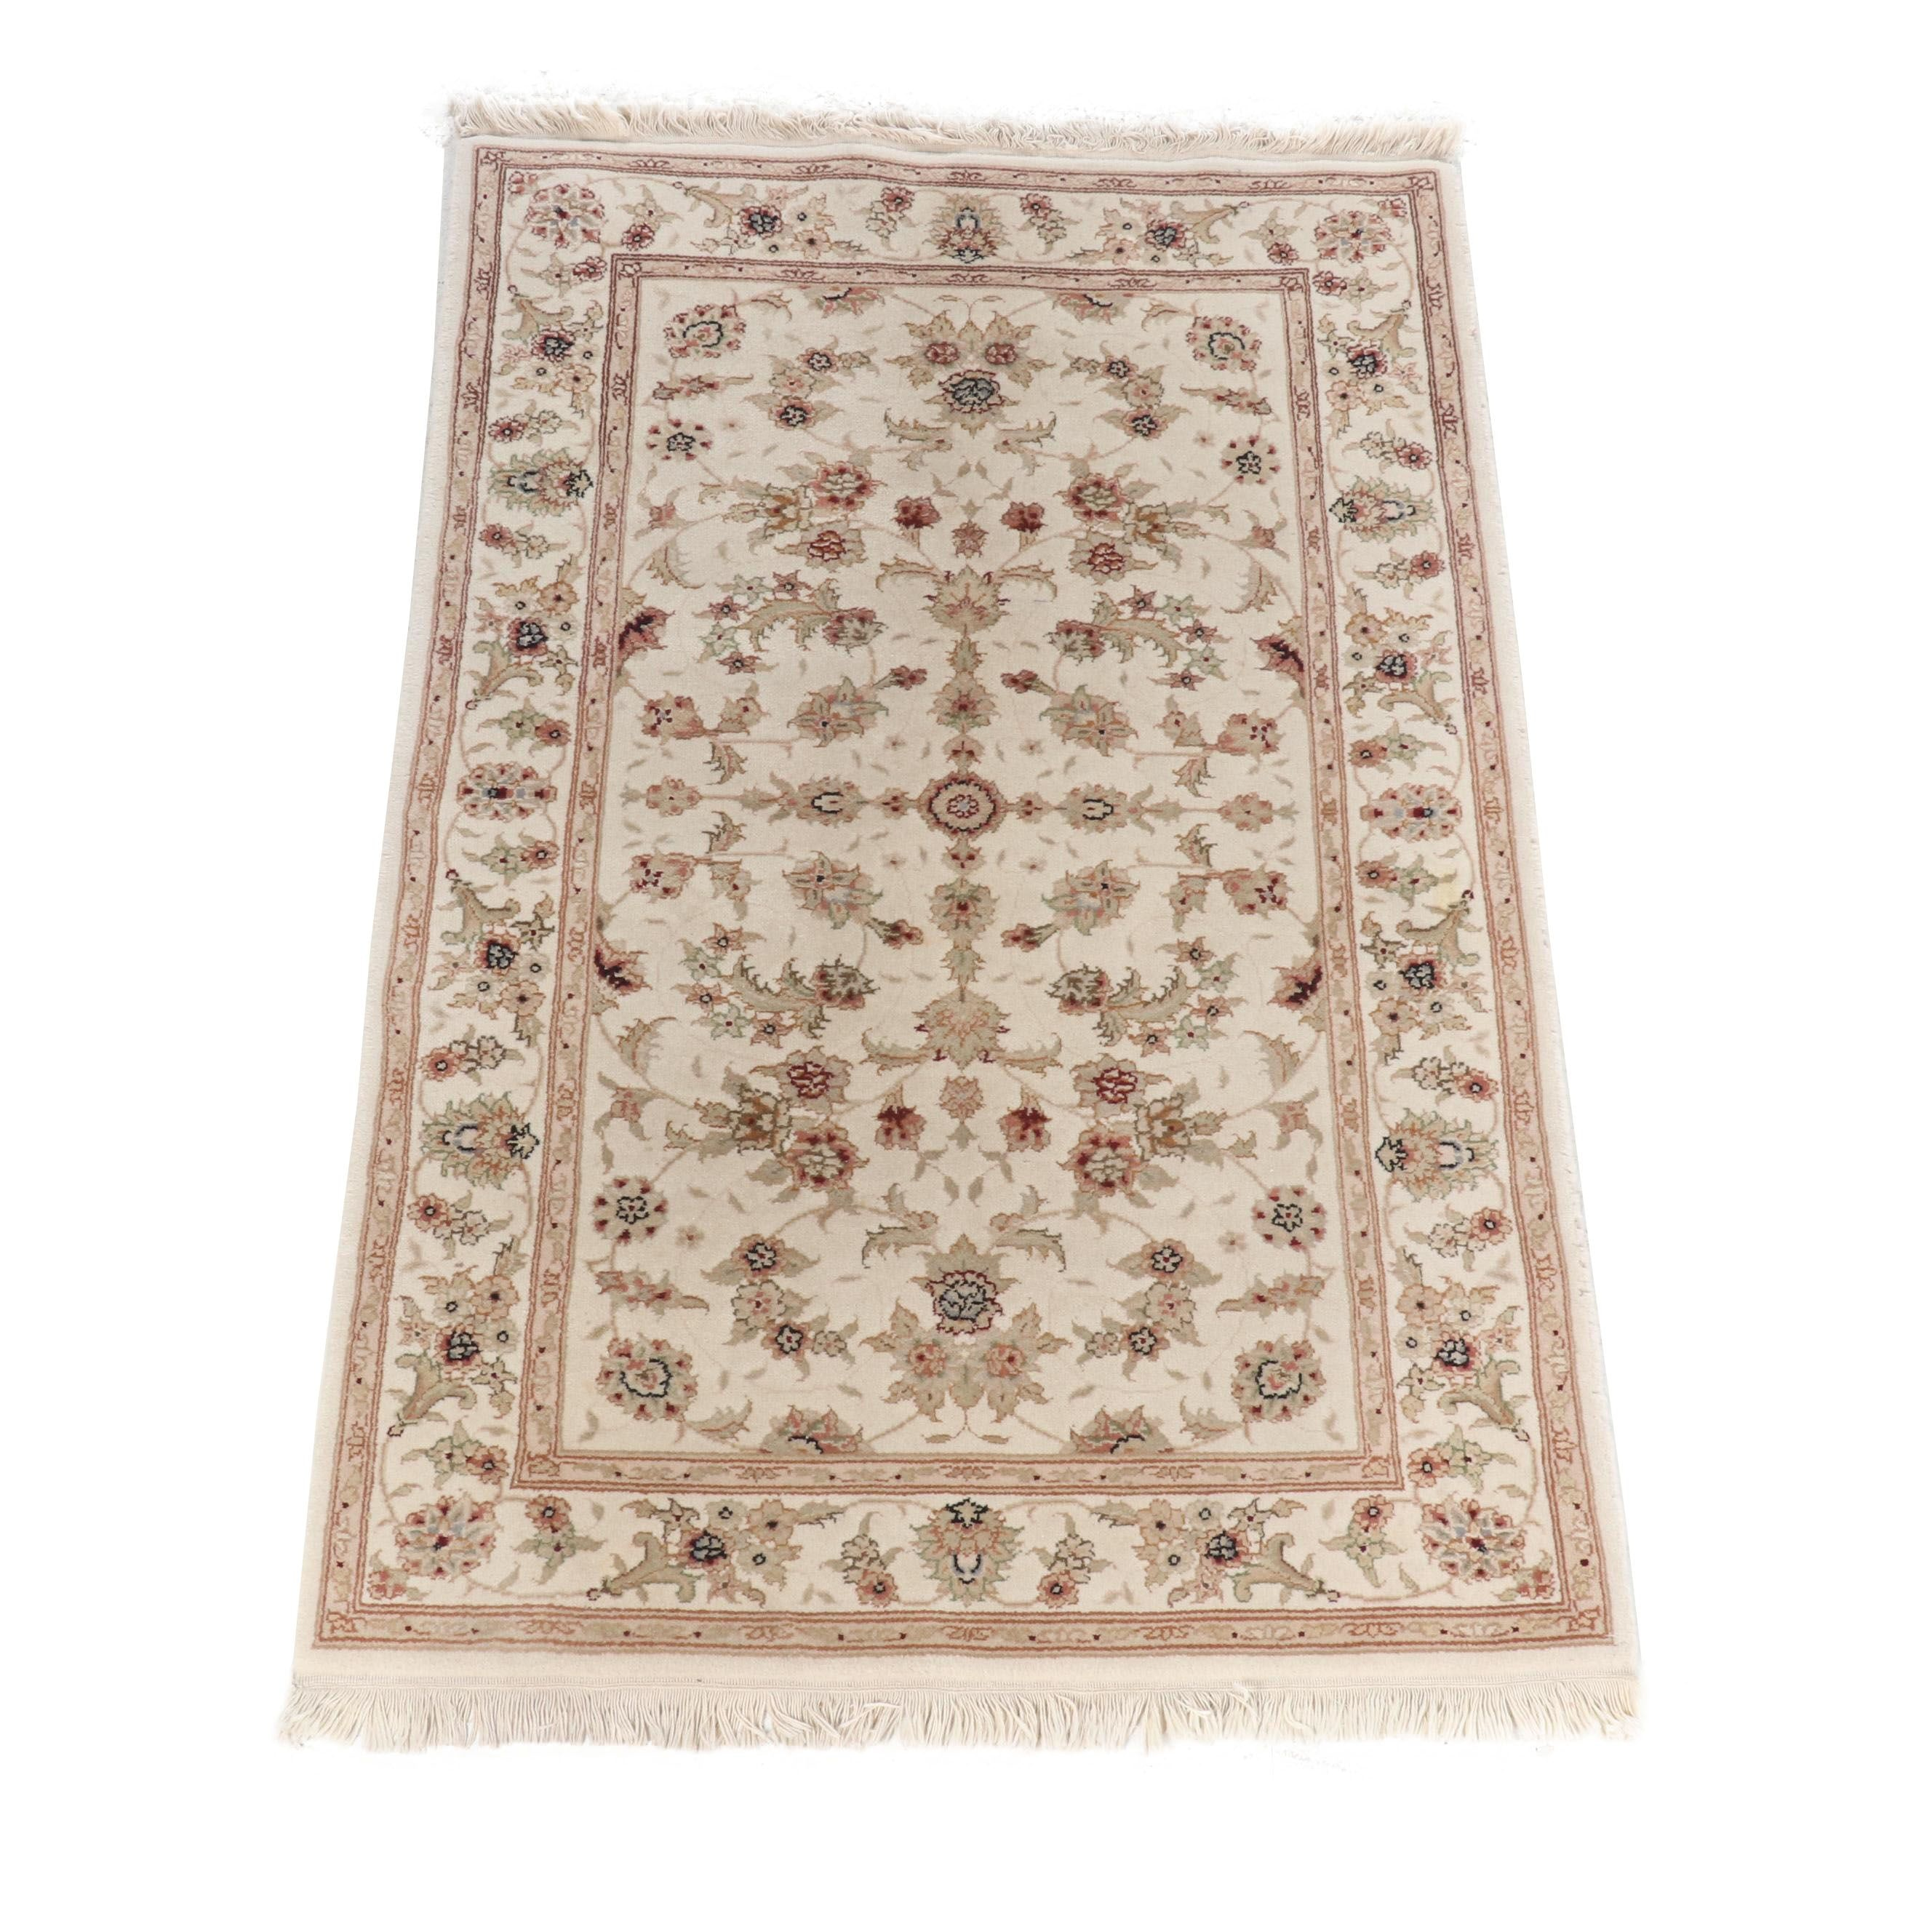 Hand-Knotted Pakistani Kashan Wool Rug